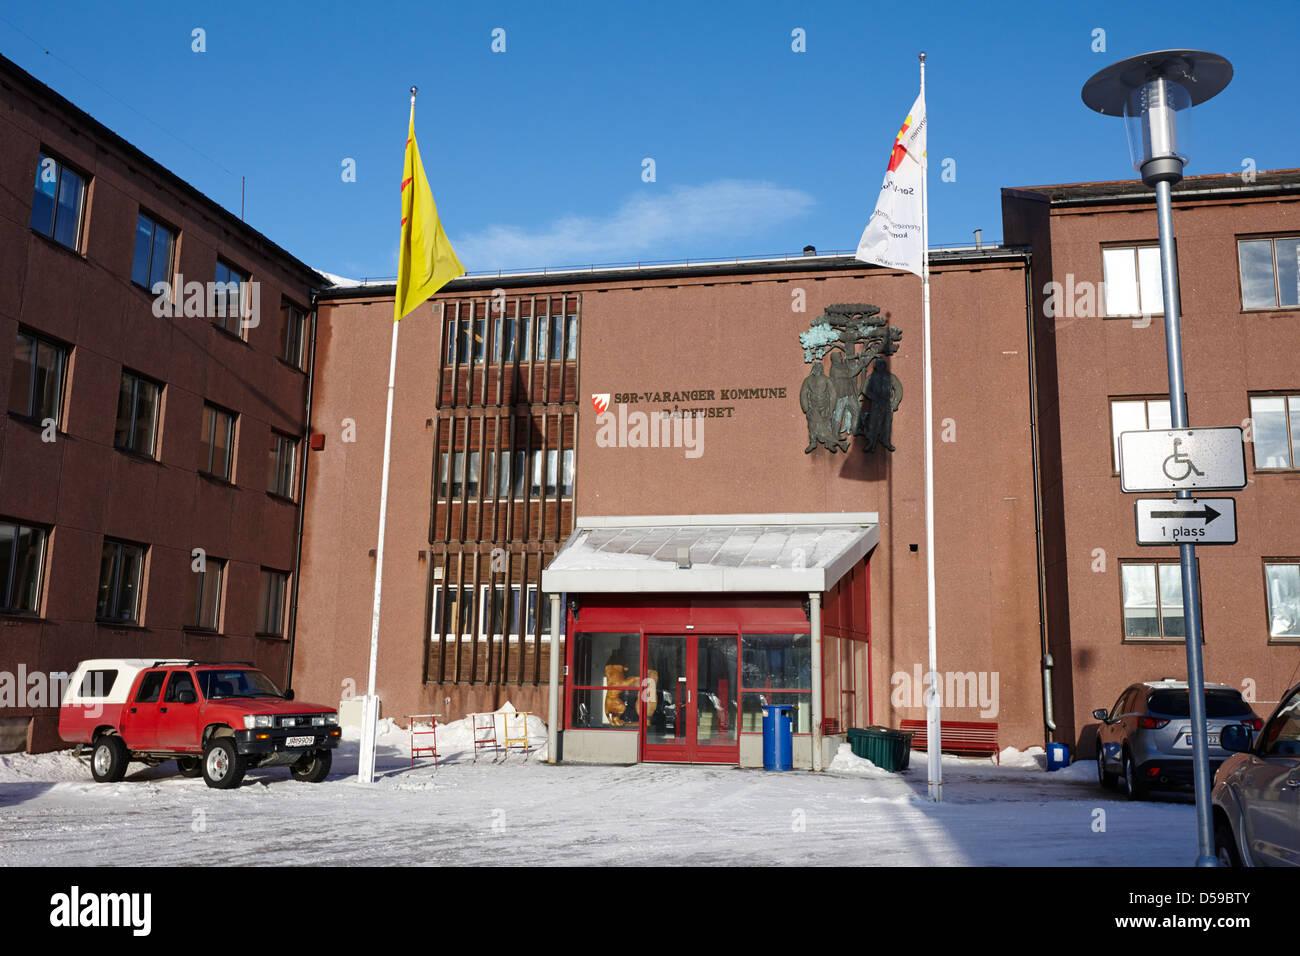 sor-varanger kommune administration building council offices kirkenes finnmark norway europe Stock Photo